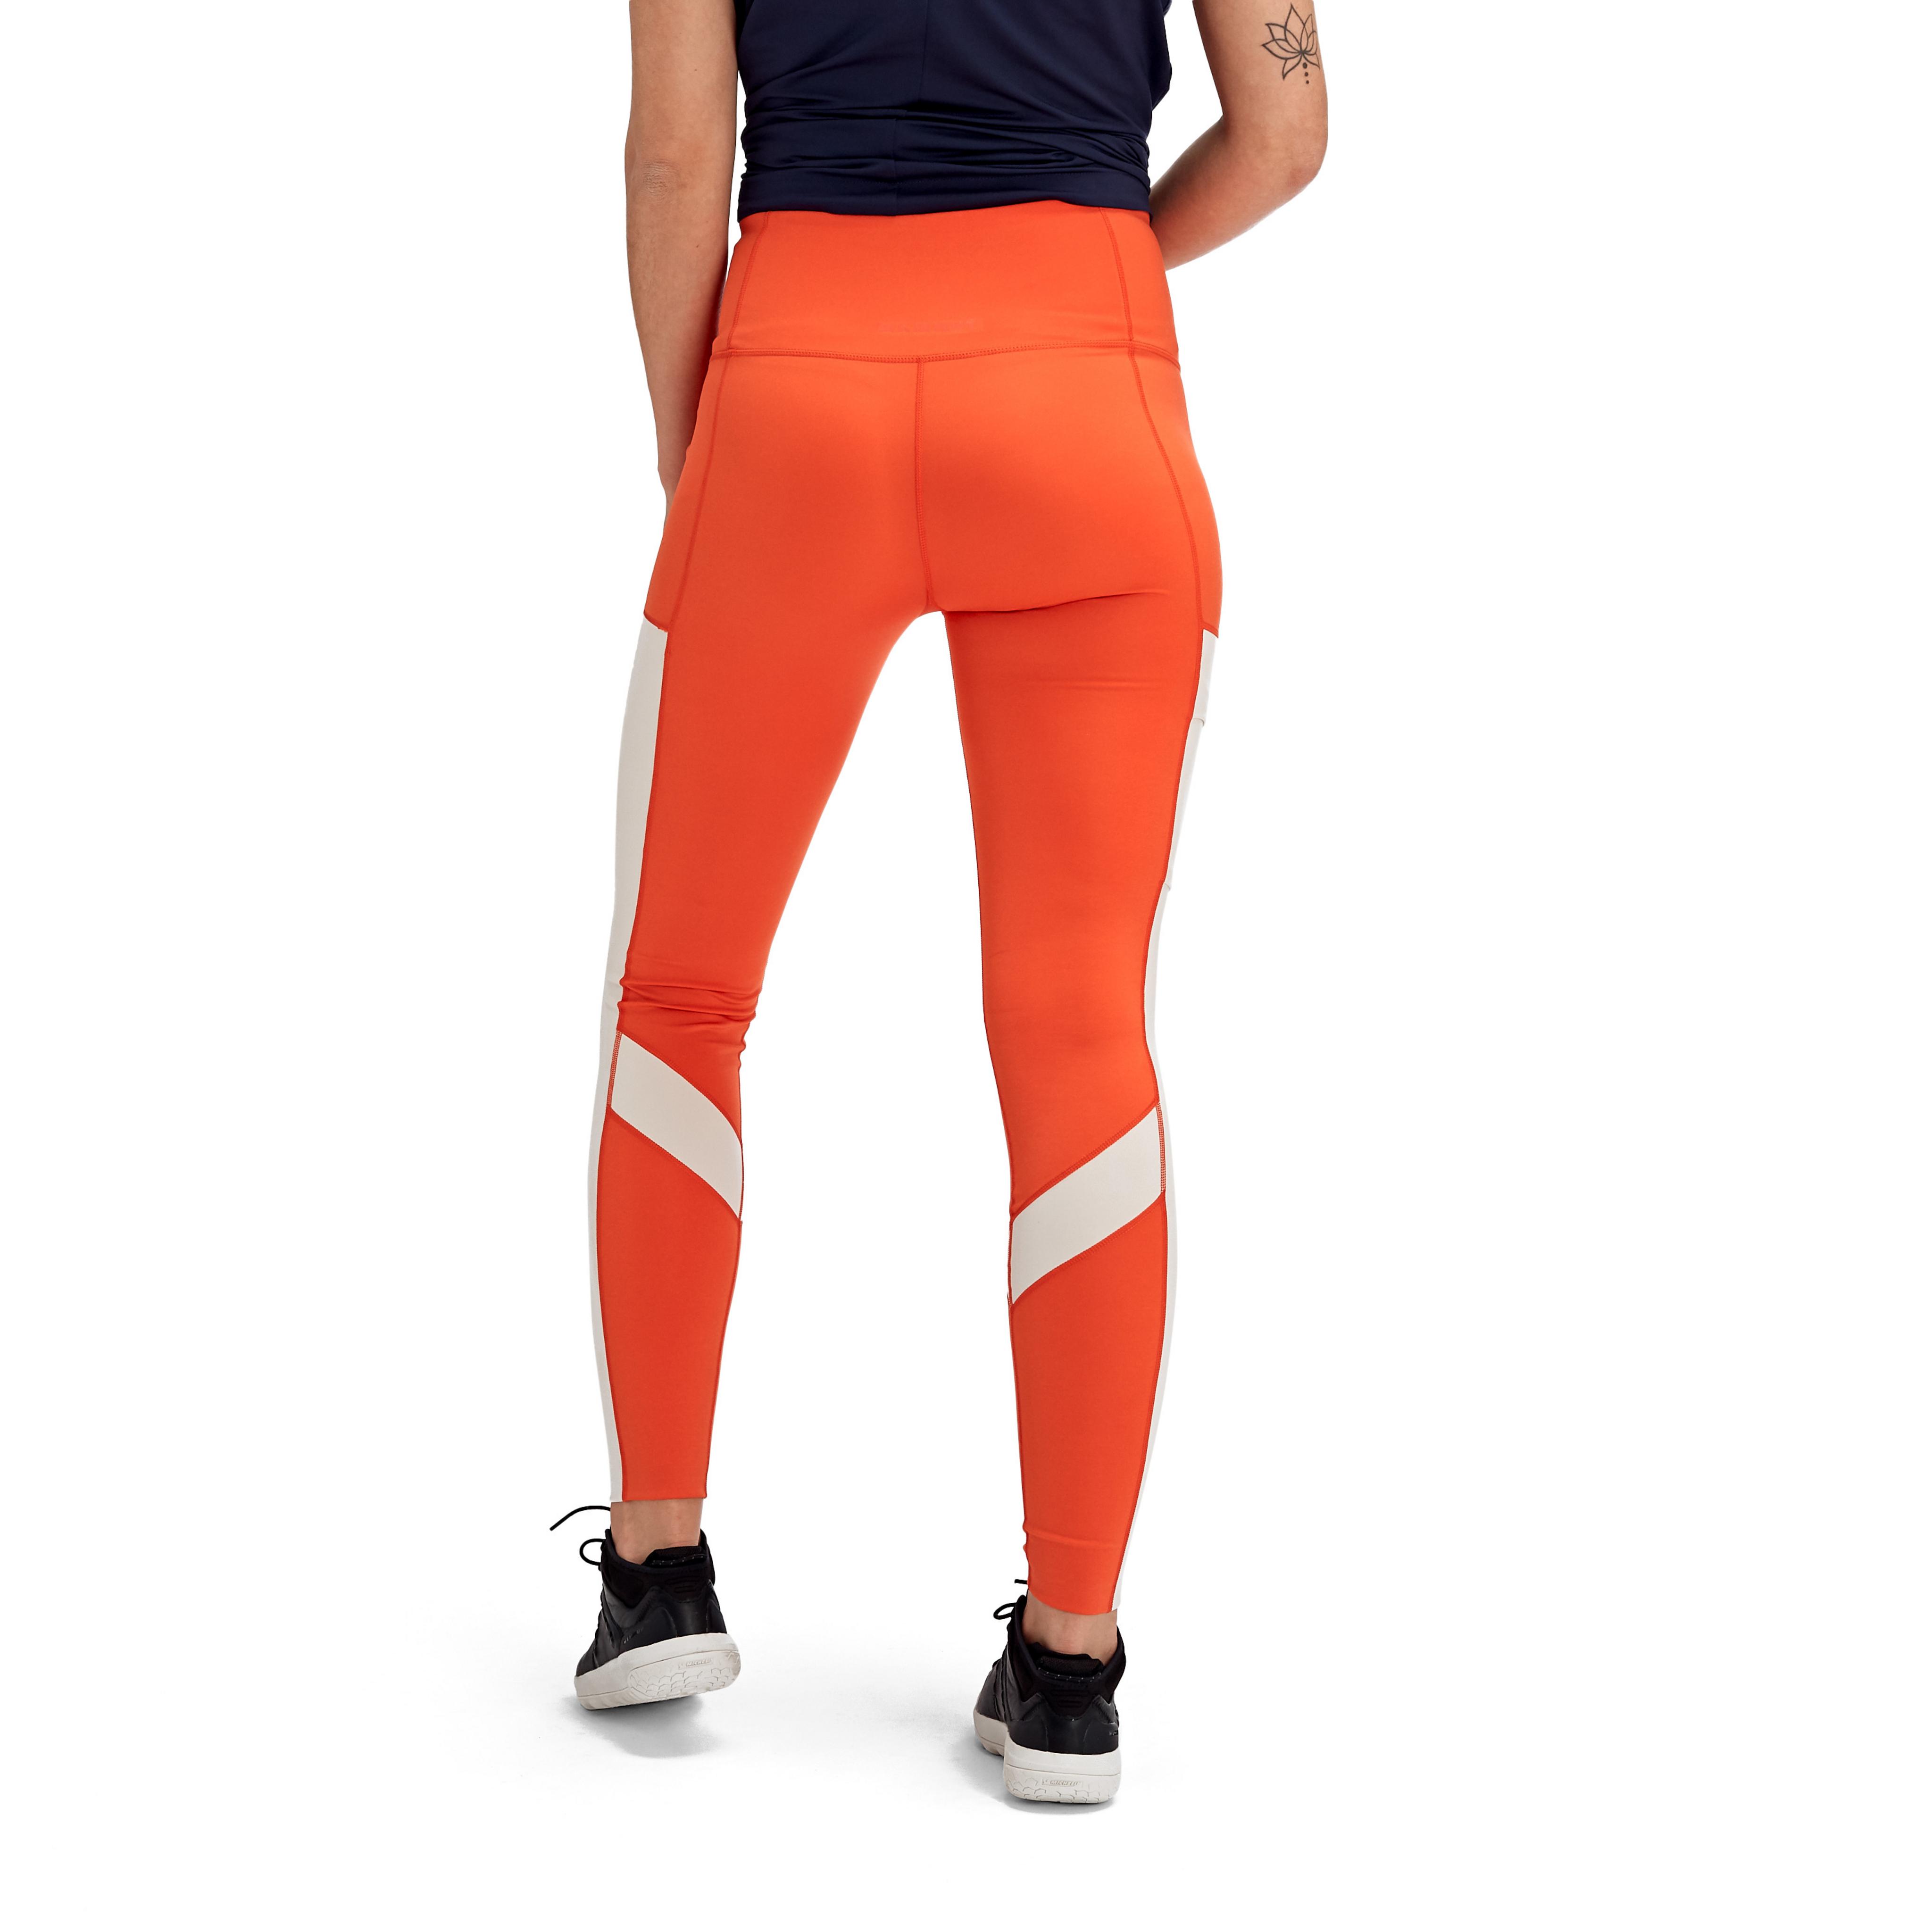 Vella Tights Women product image